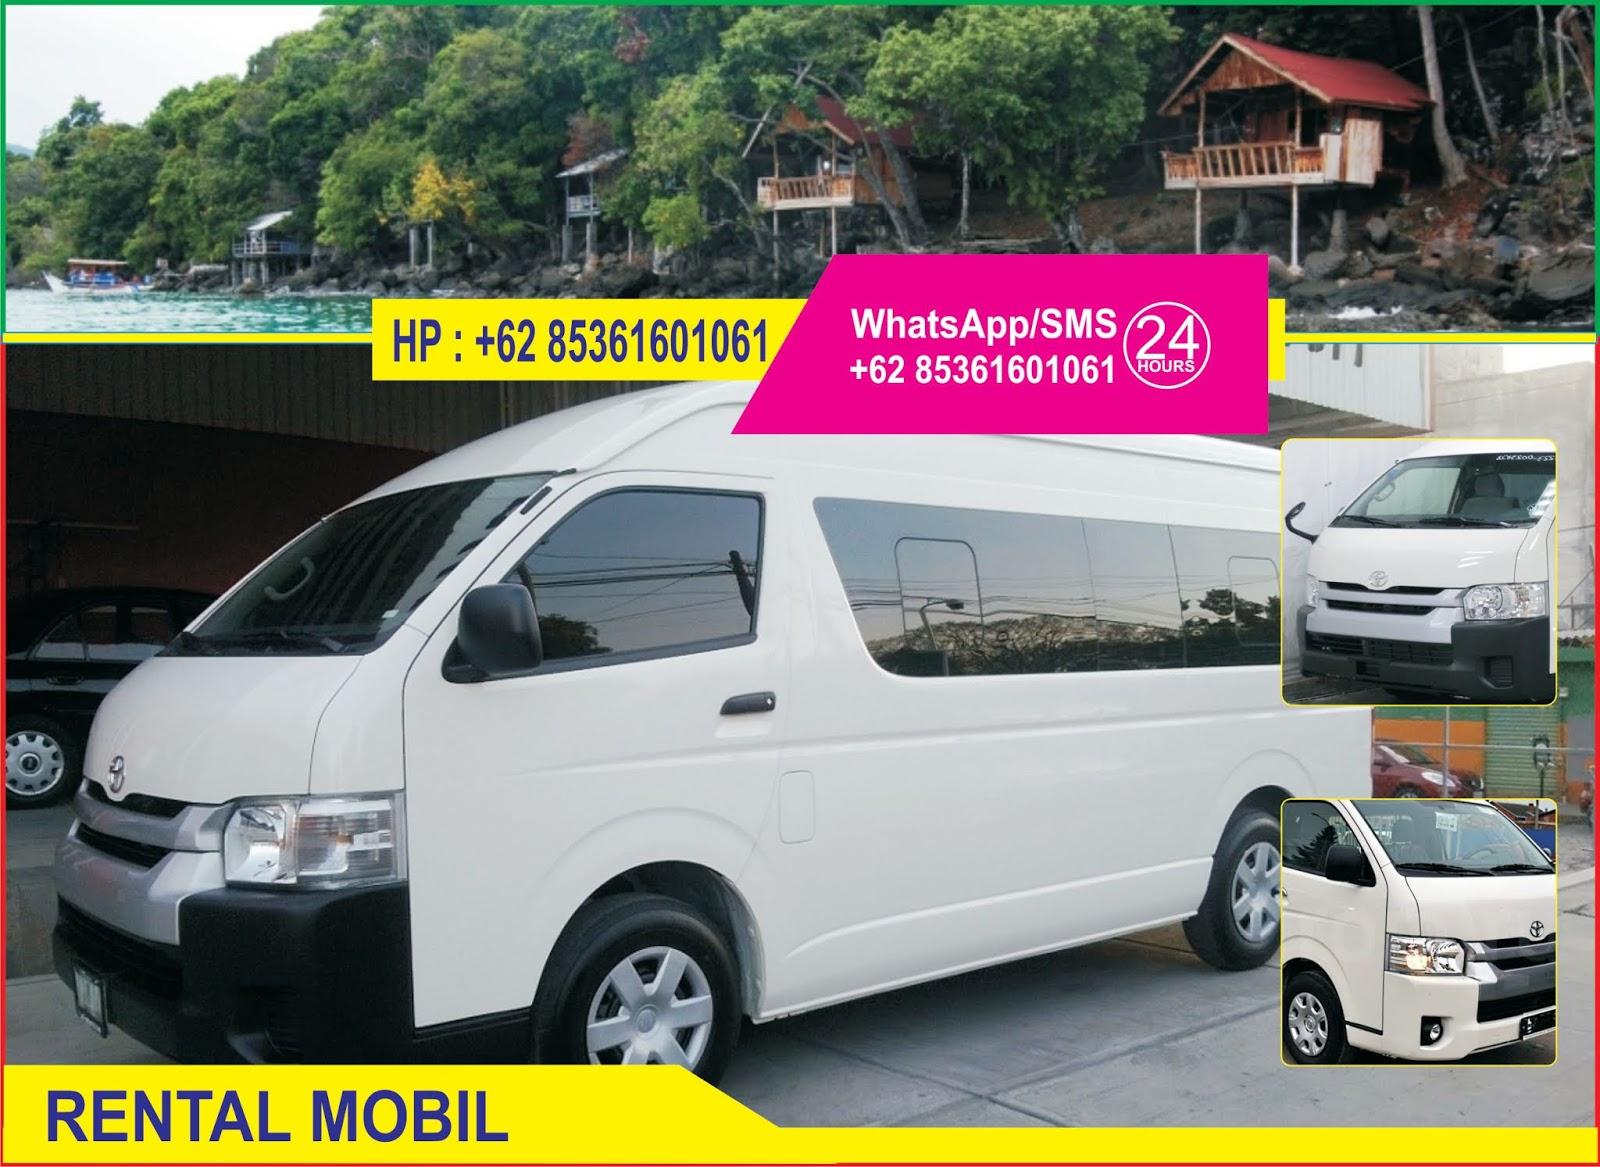 Rental Mobil Hiace Banda Aceh Travel Agent Aceh Travel Agent In Aceh Aceh Tour